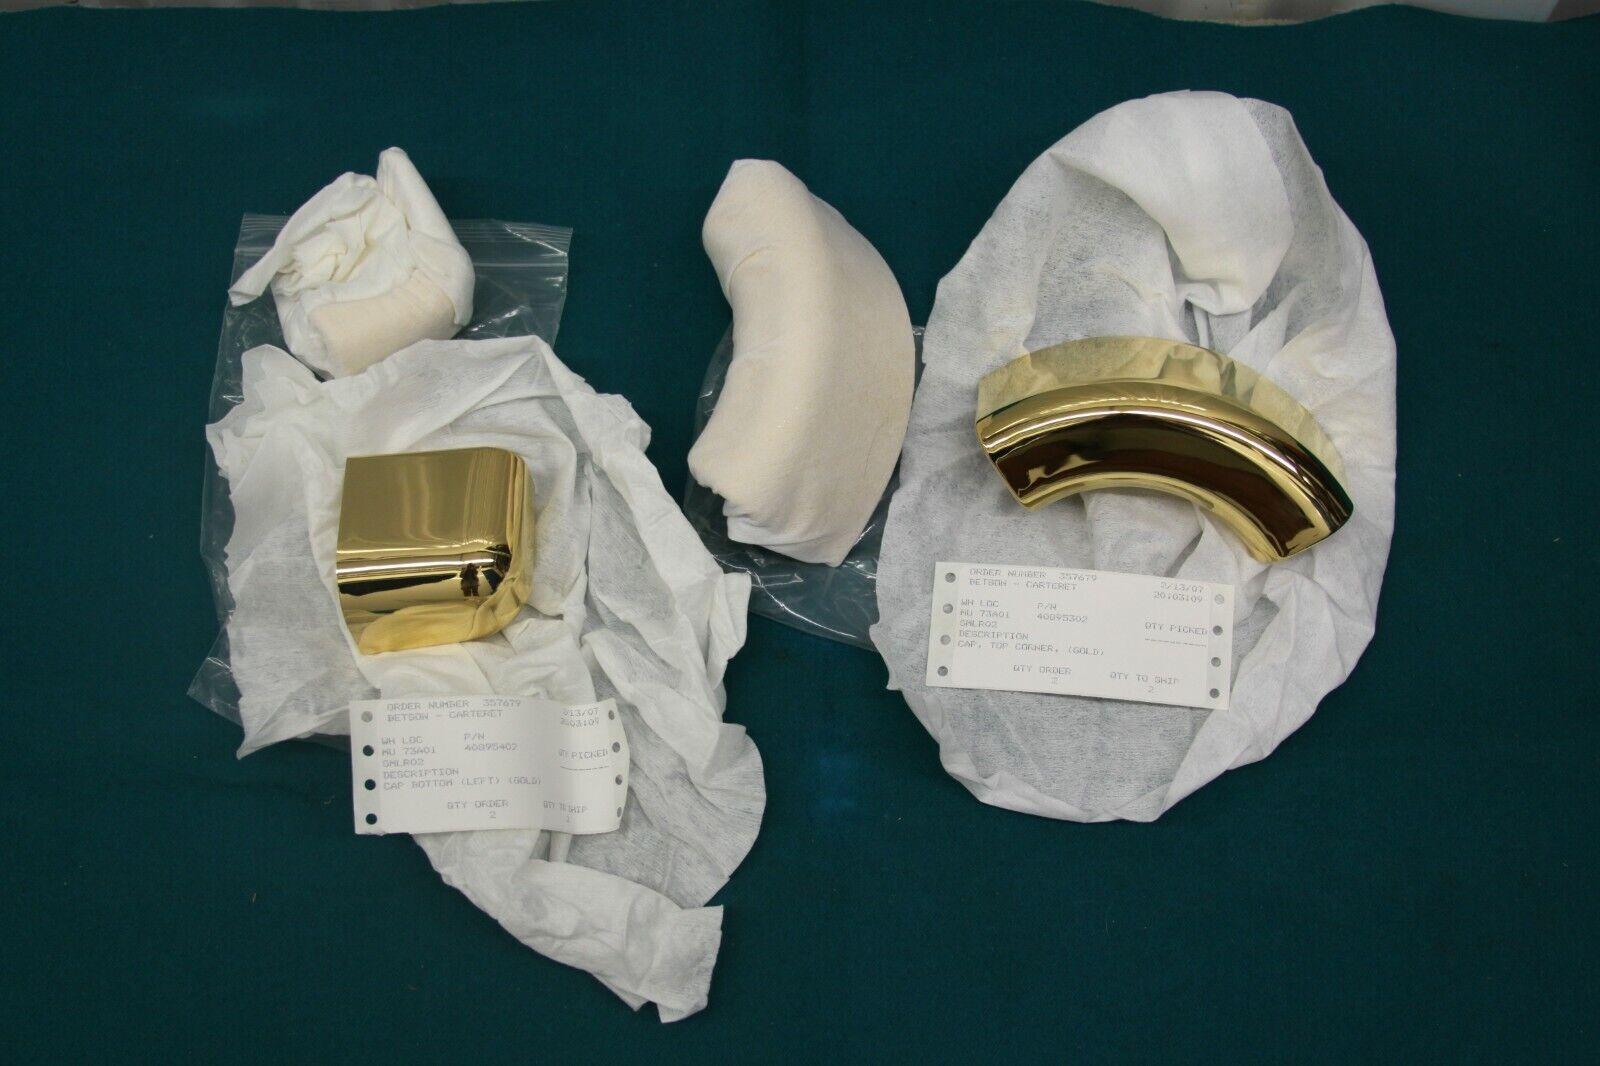 NOS Rowe AMI Jukebox CD Wall Berekley Gold Trim Set Complete